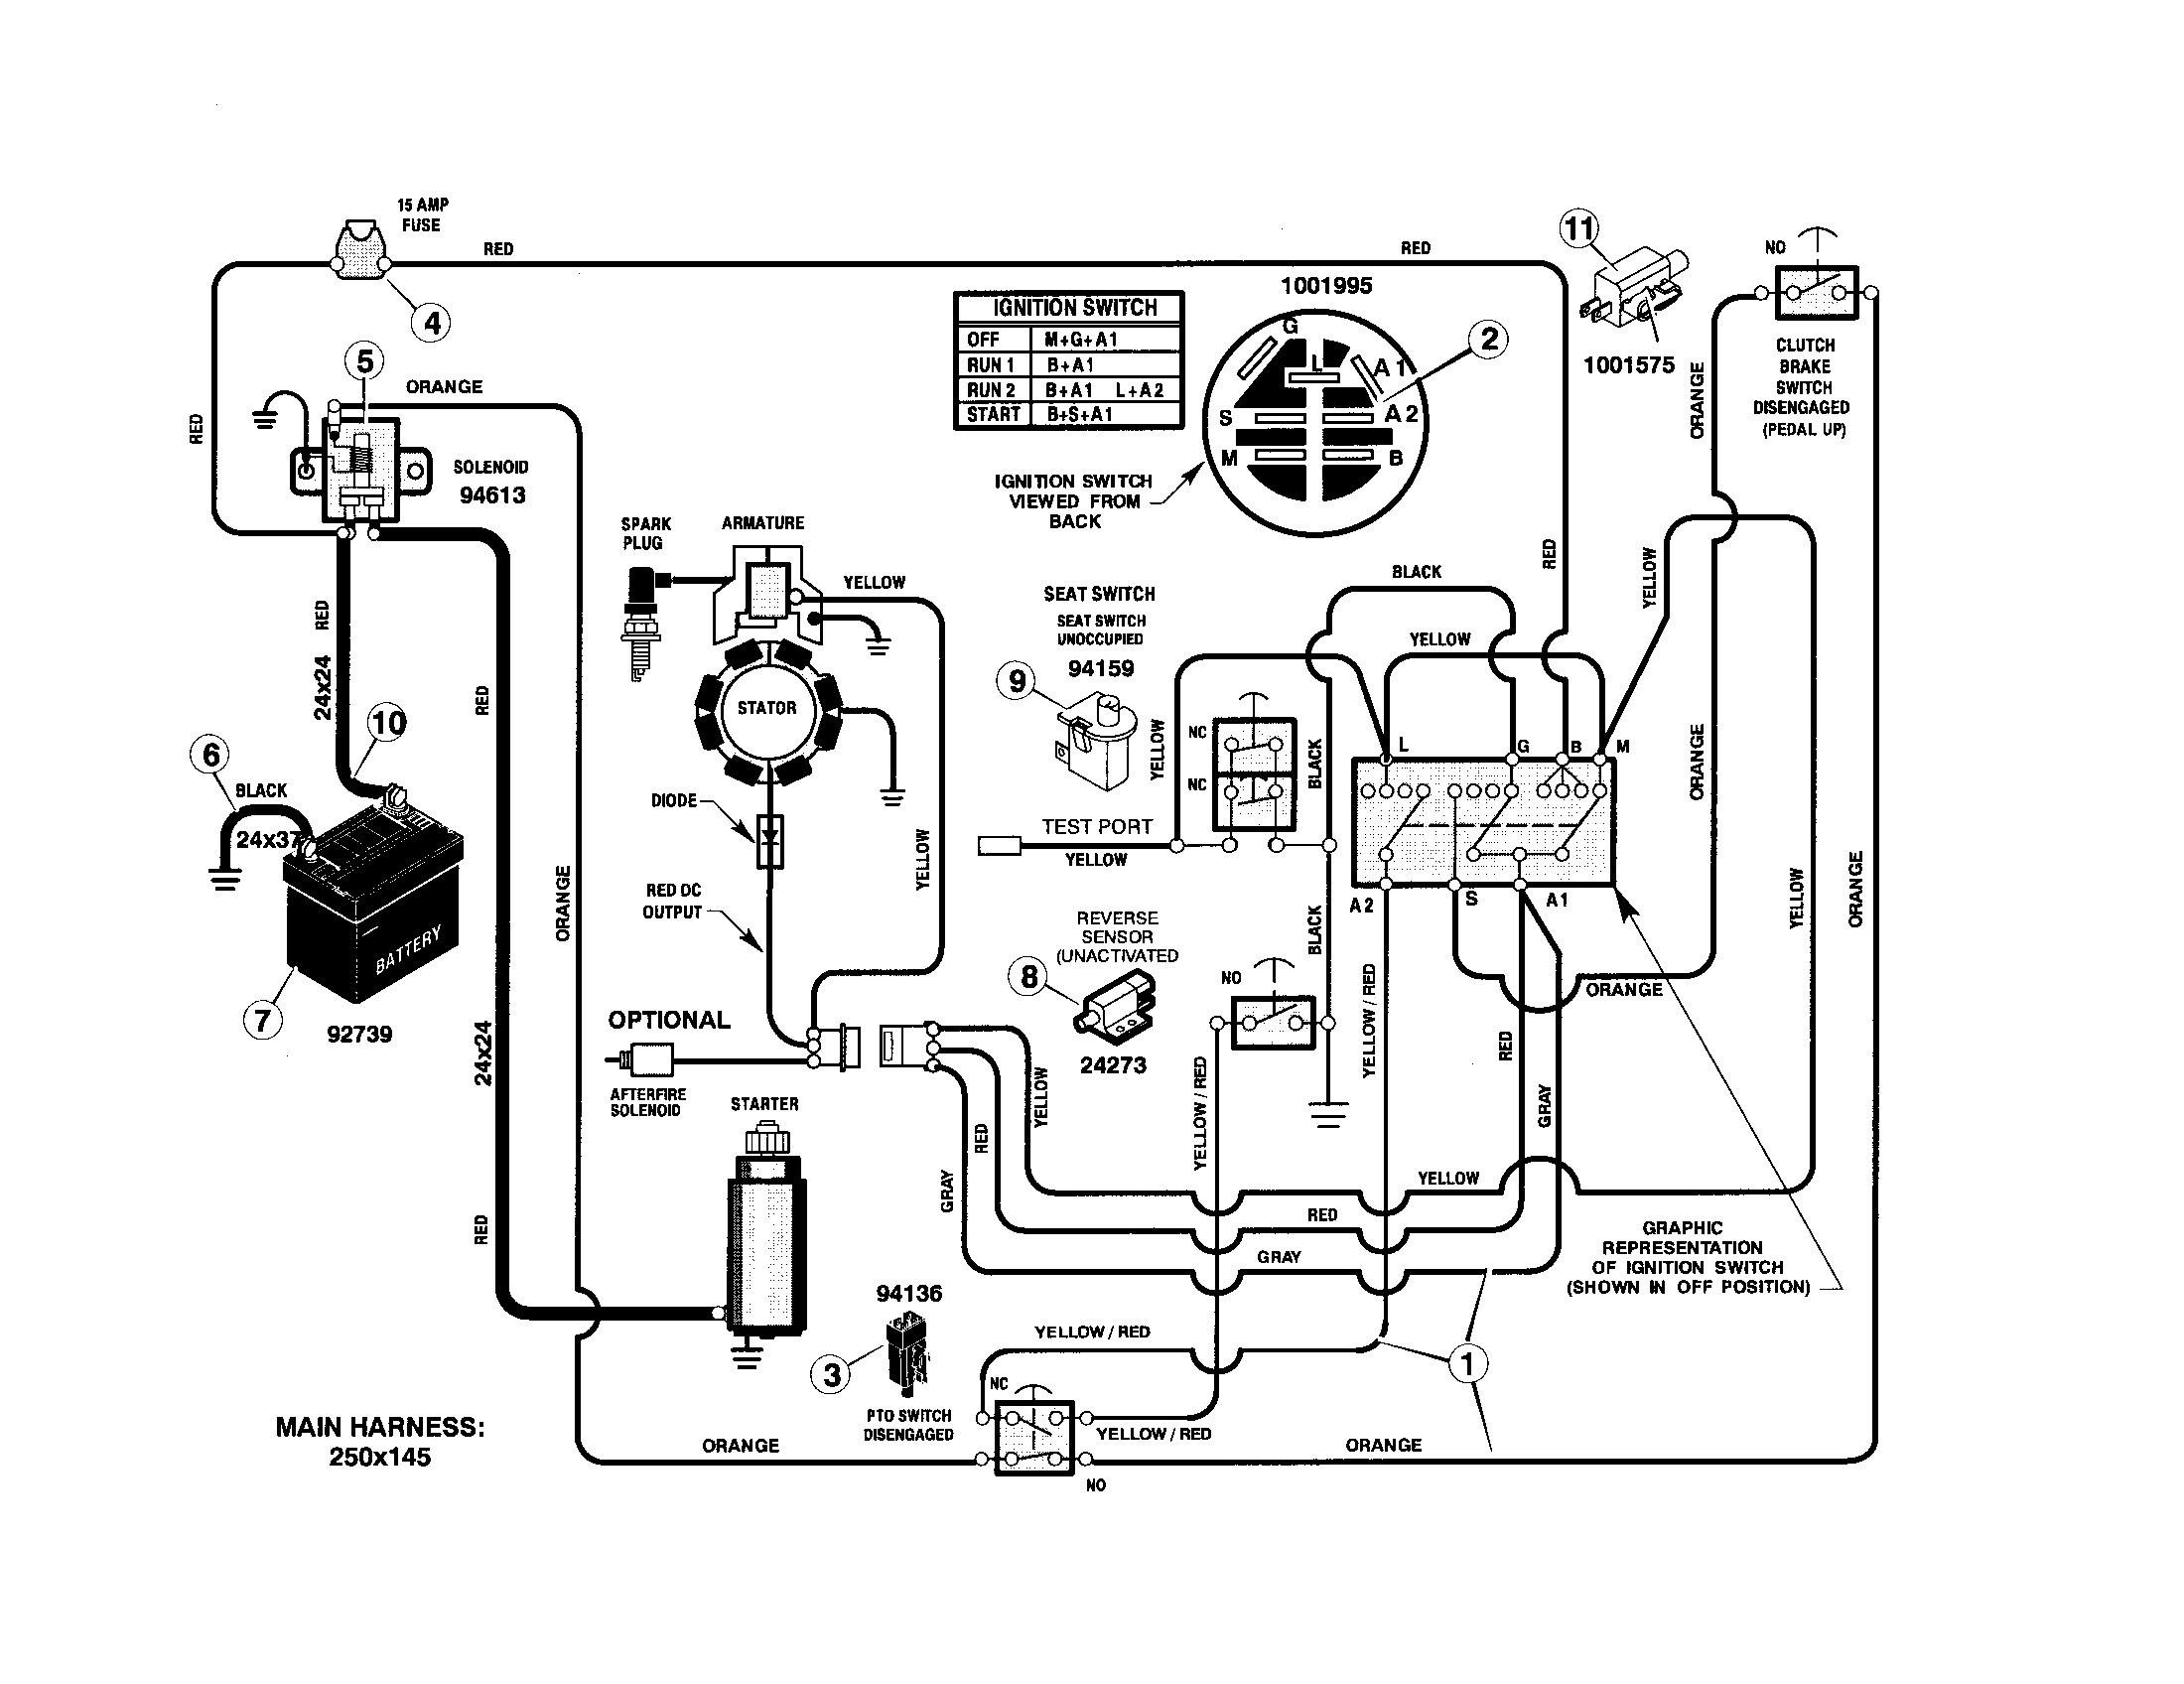 Wiring Diagram For John Deere 322